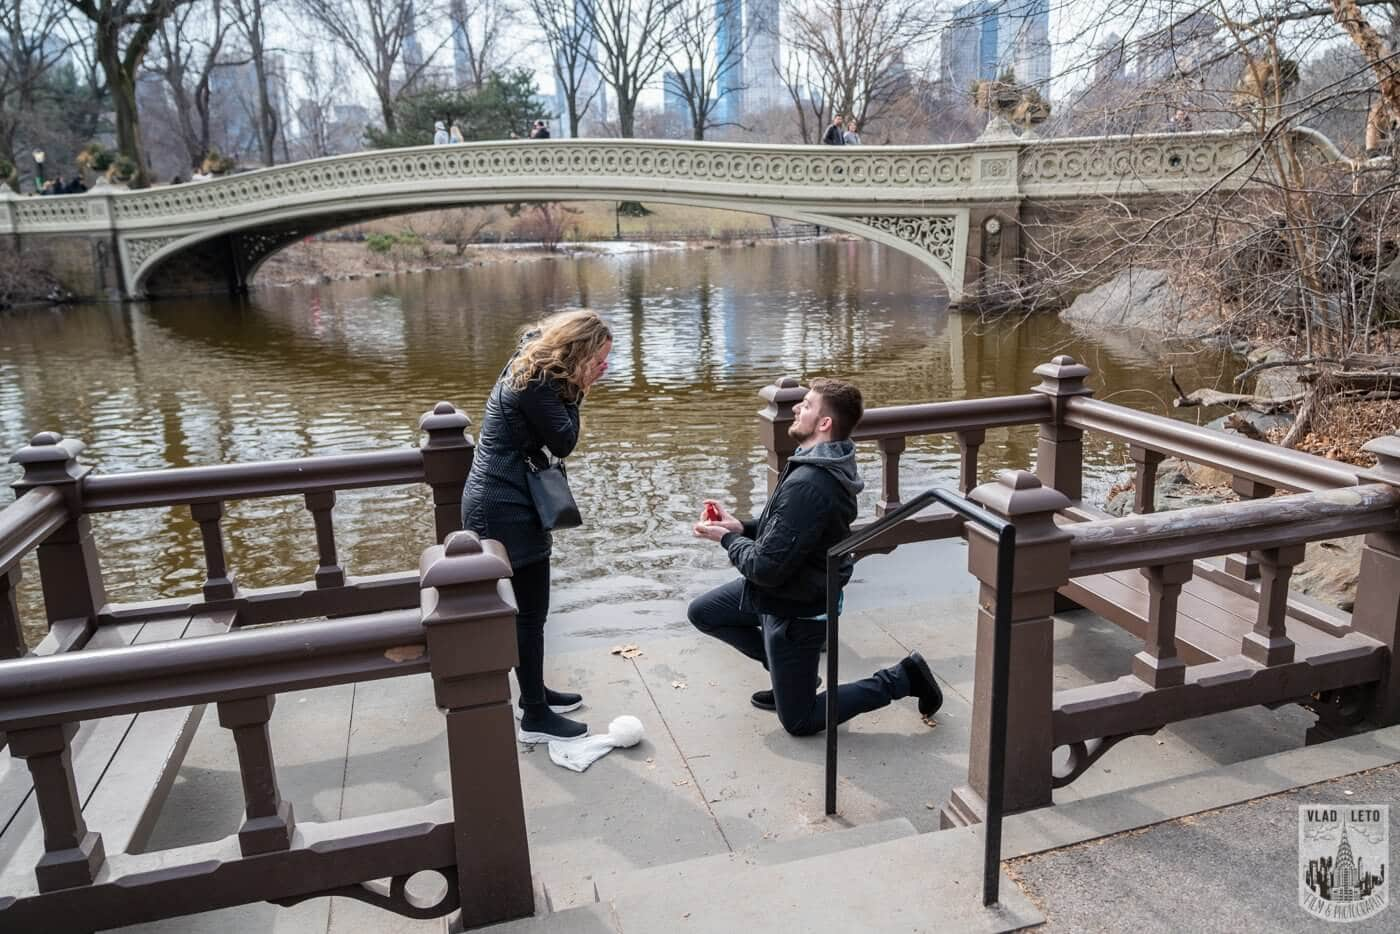 Photo Bow bridge wedding proposal in Central Park   VladLeto